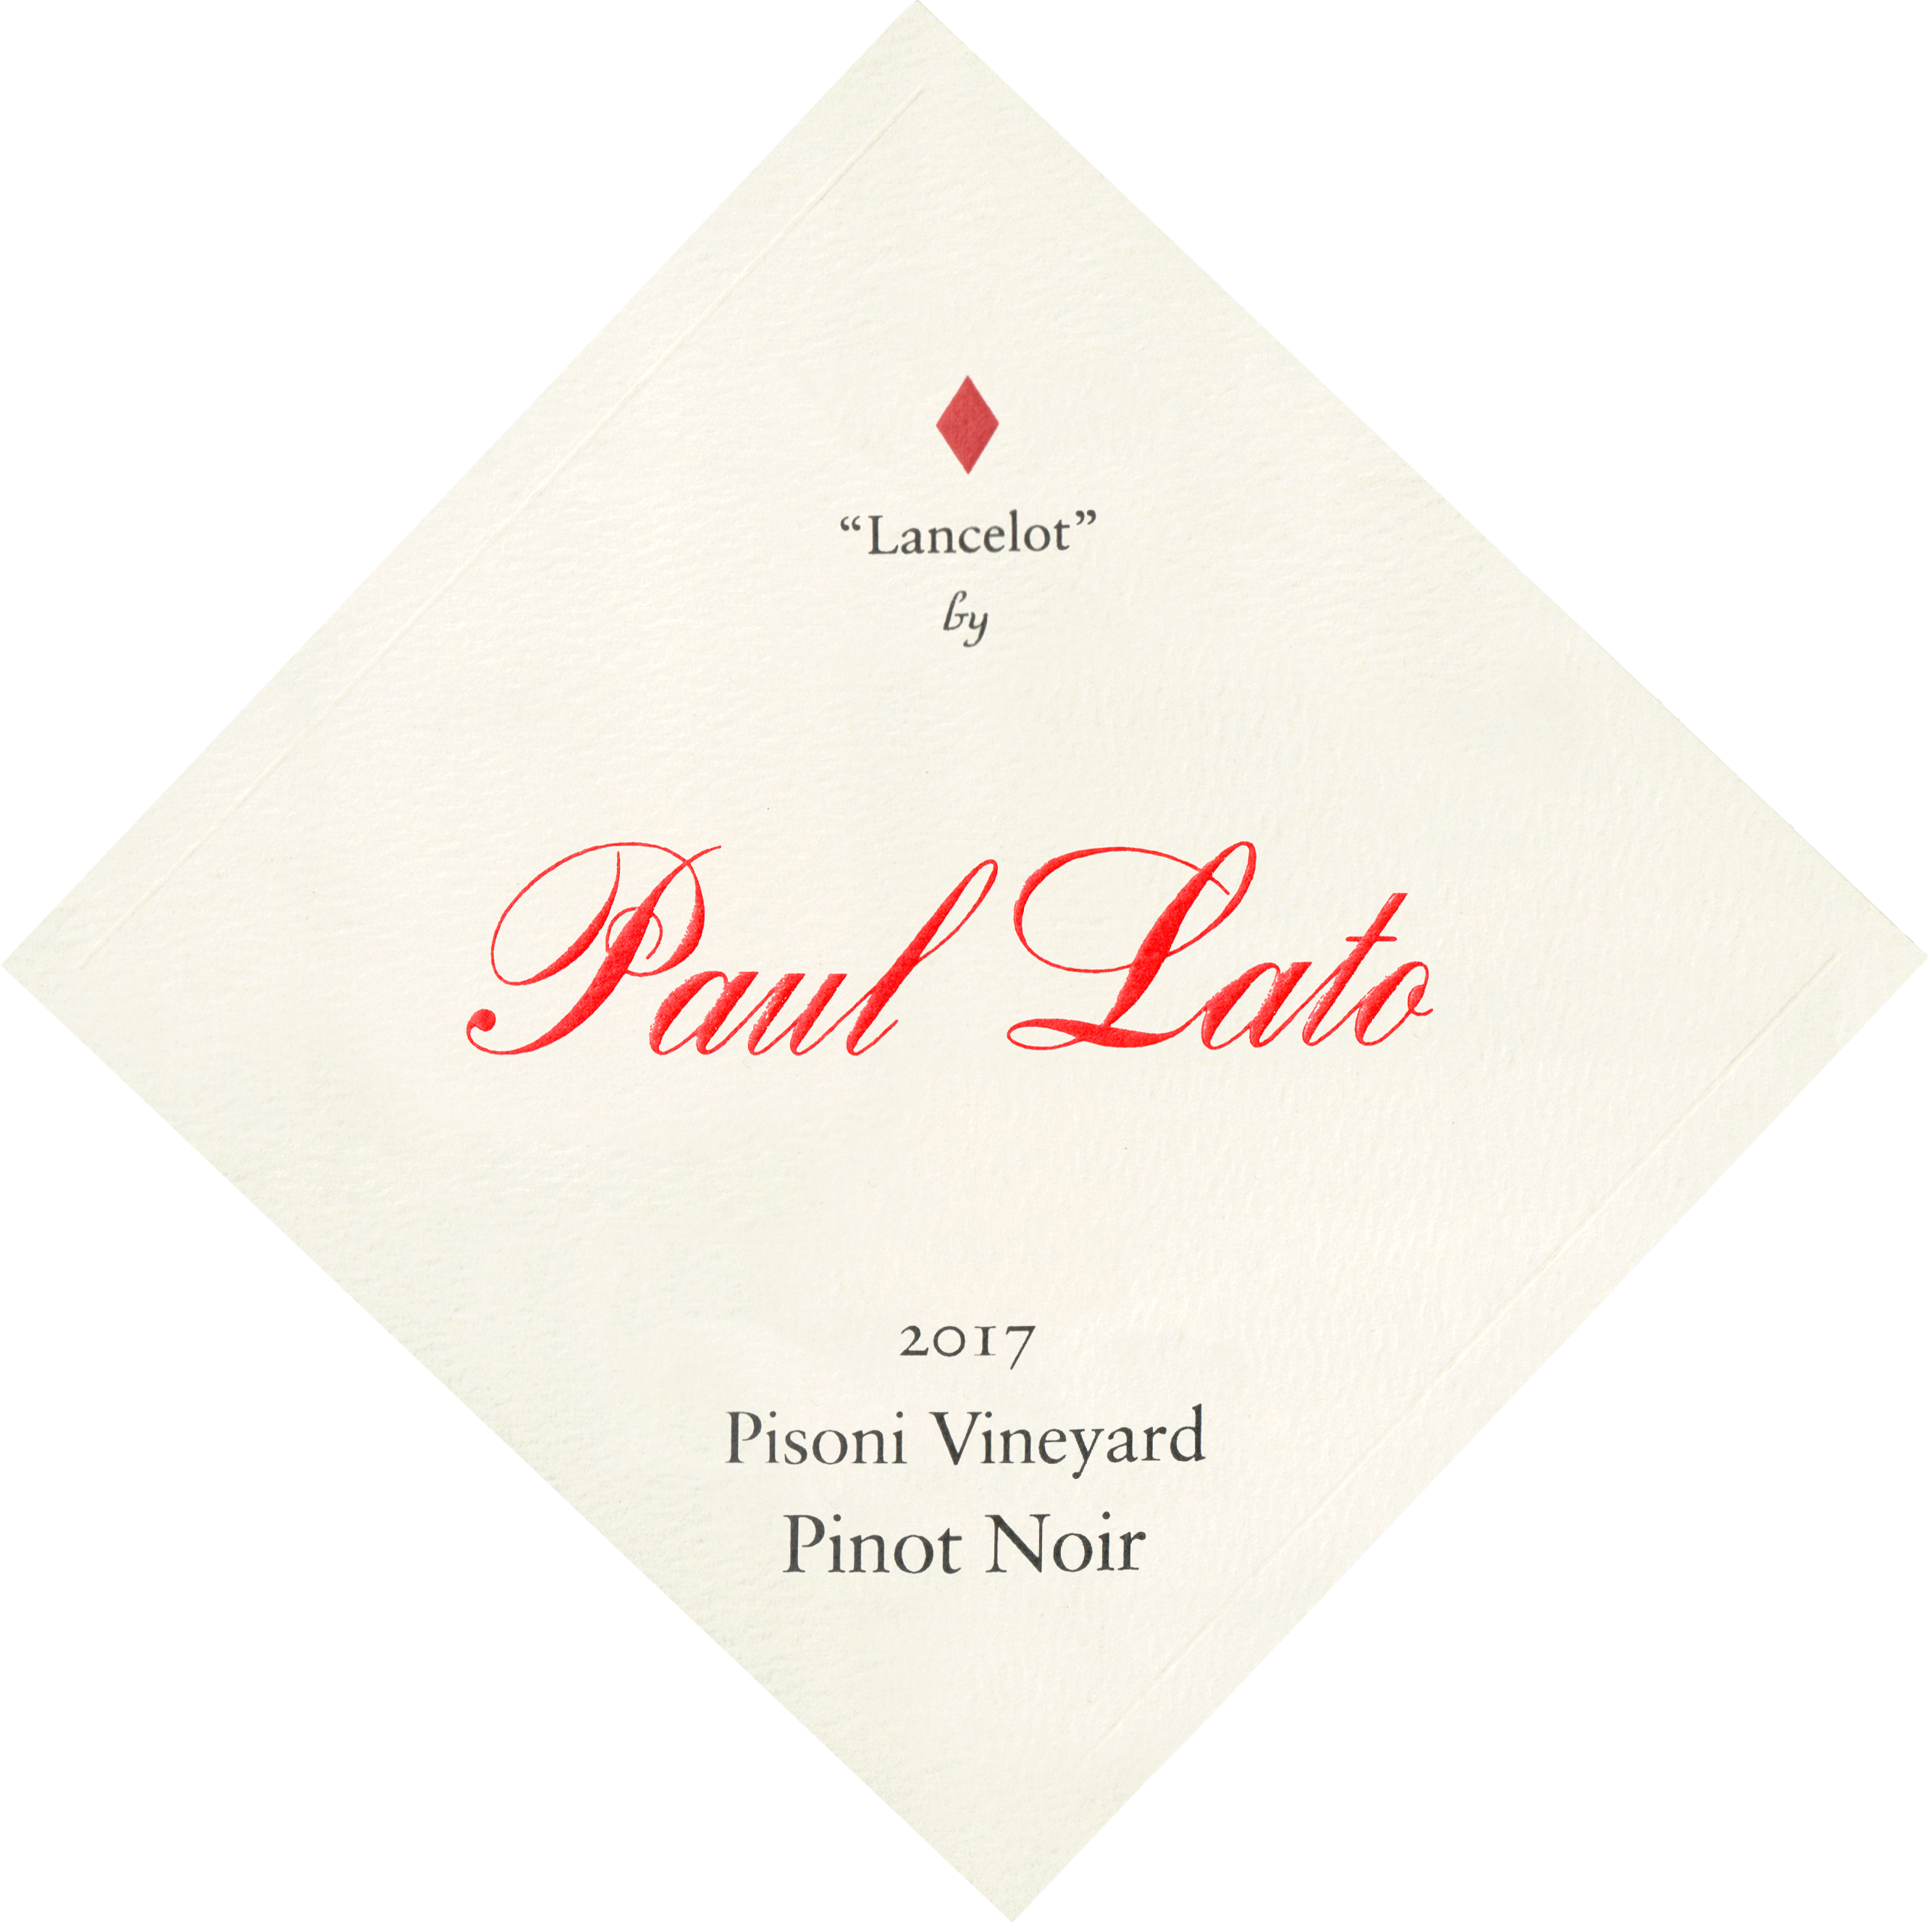 Paul Lato Lancelot Pisoni Vineyard Pinot Noir 2017